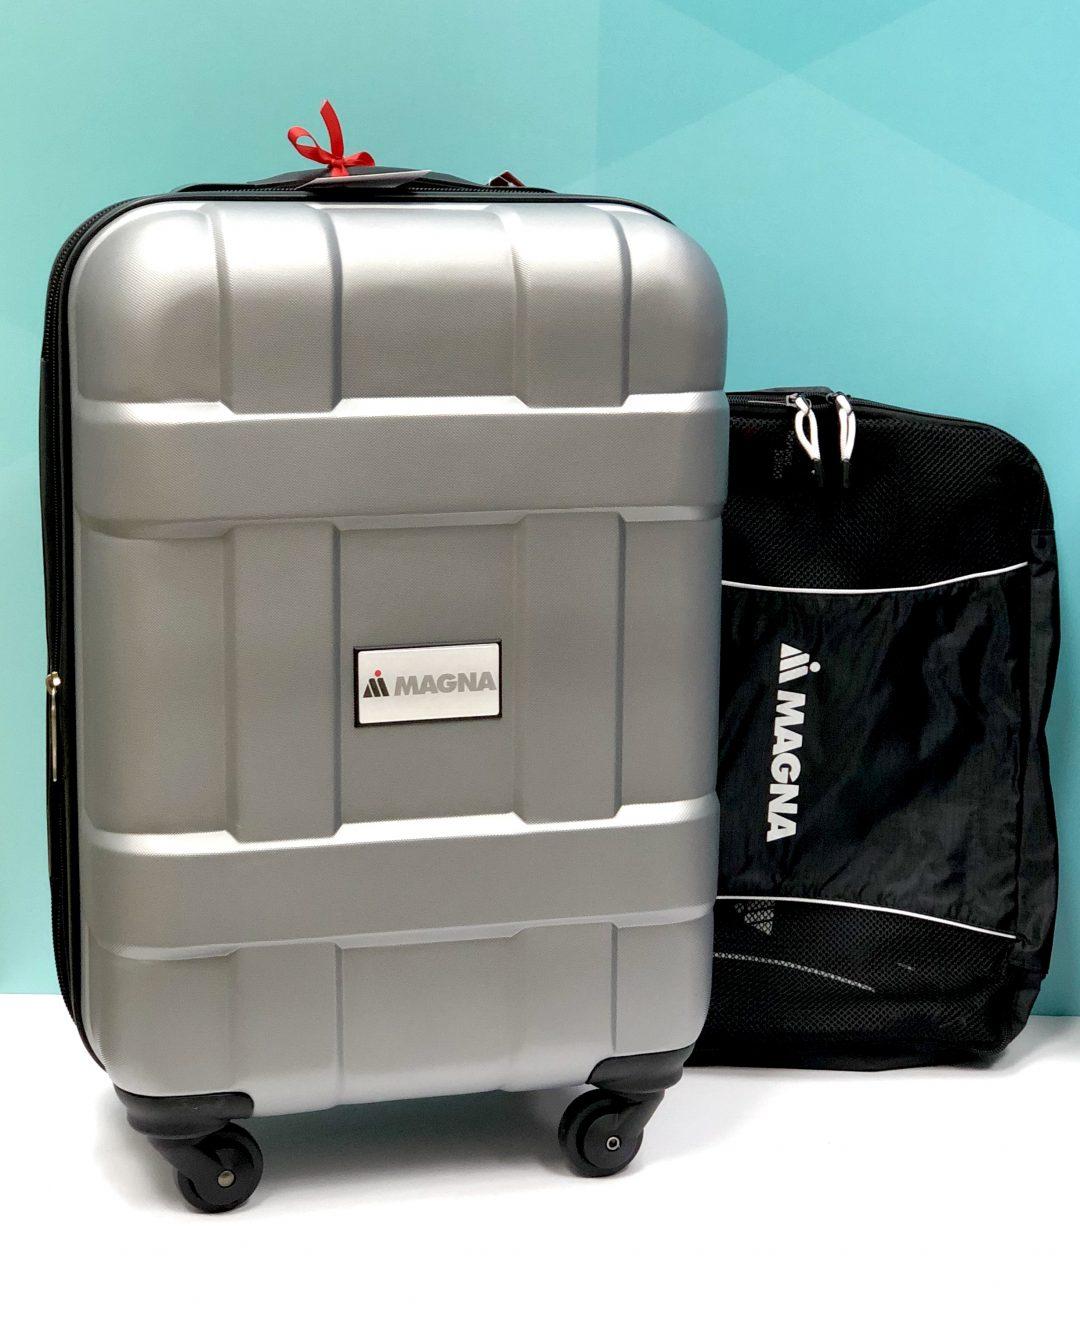 Magna luggage gift